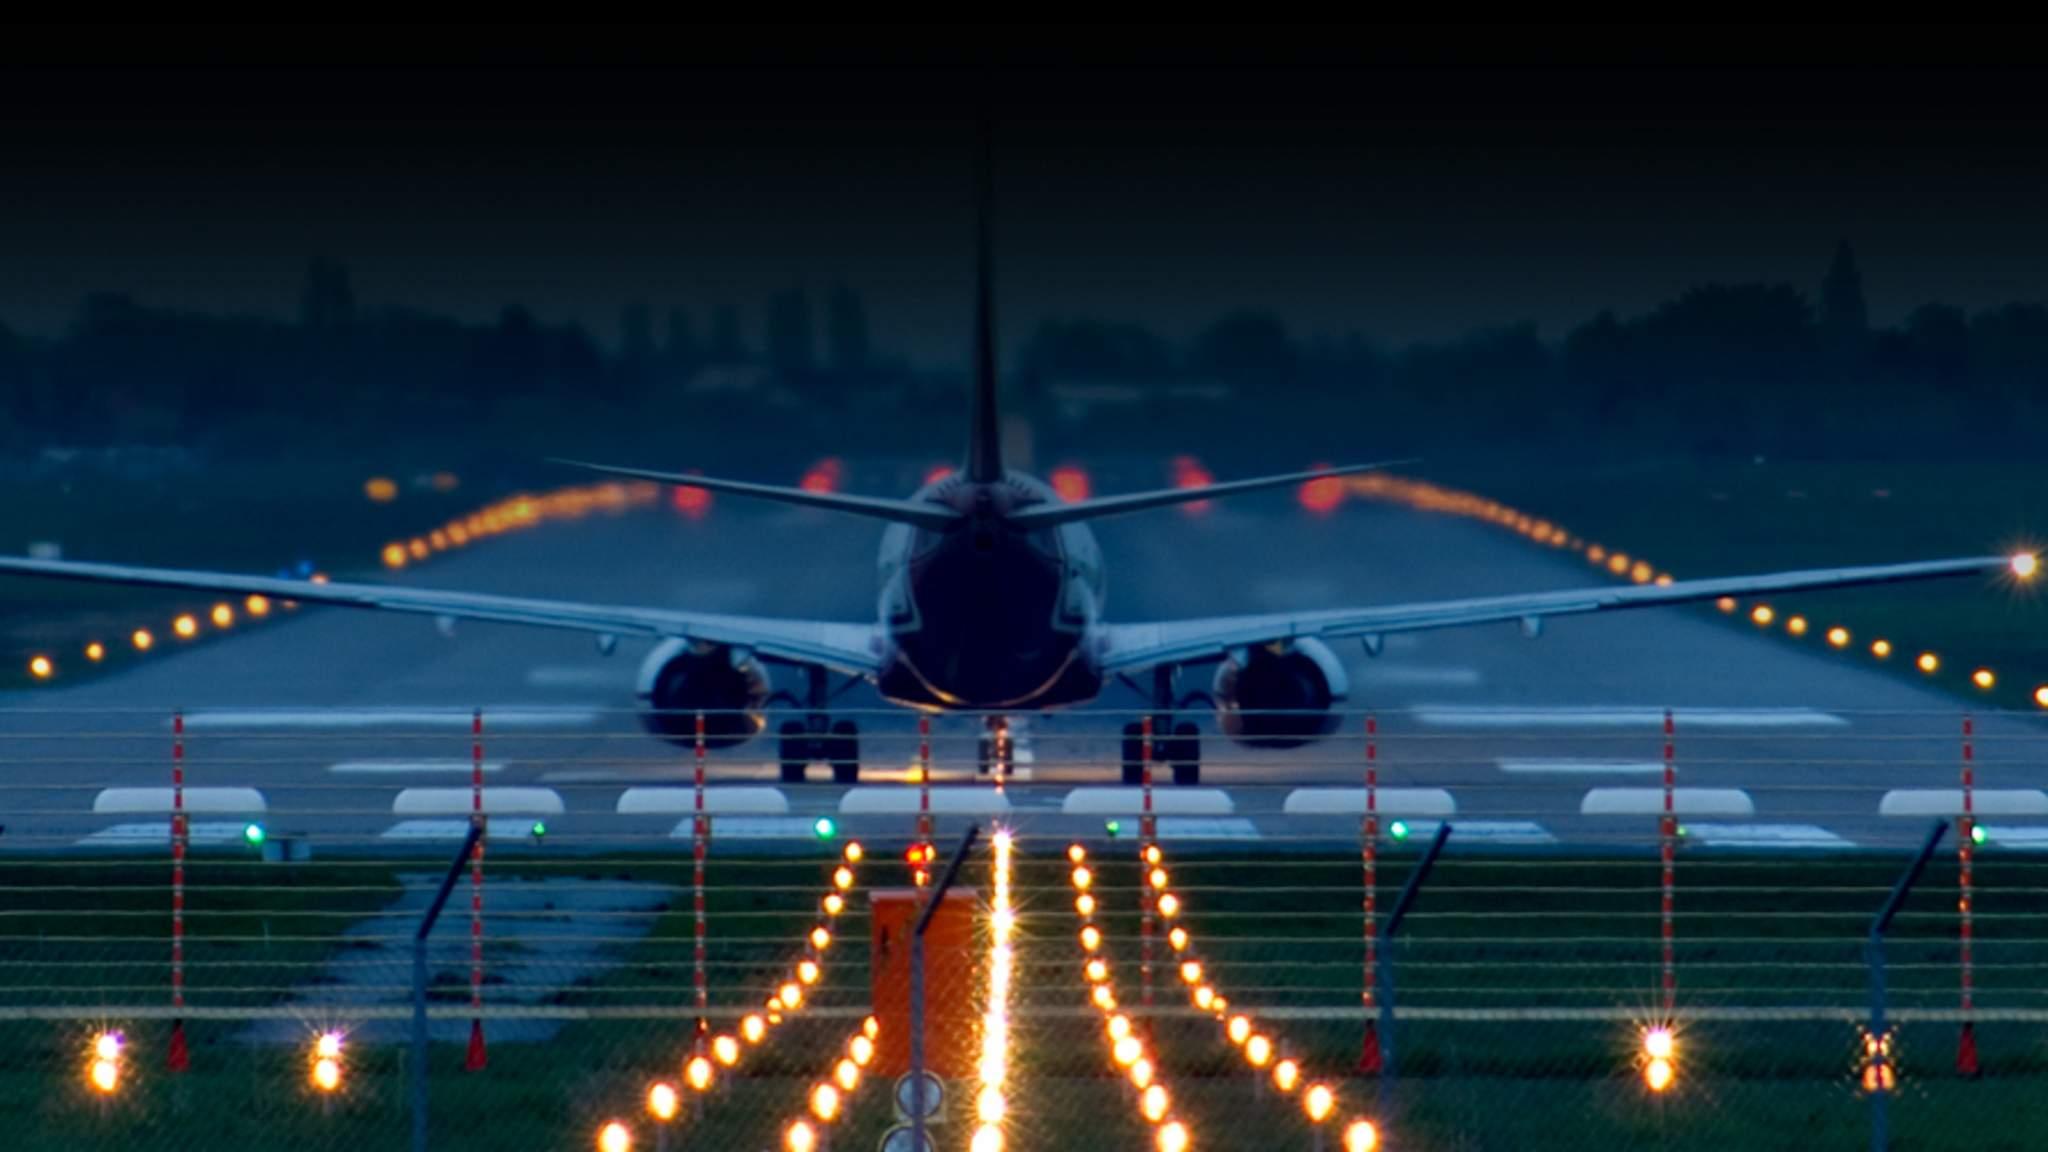 air-traffic-ipad-brand-1-2048x1152-20141214-140517-249.jpg